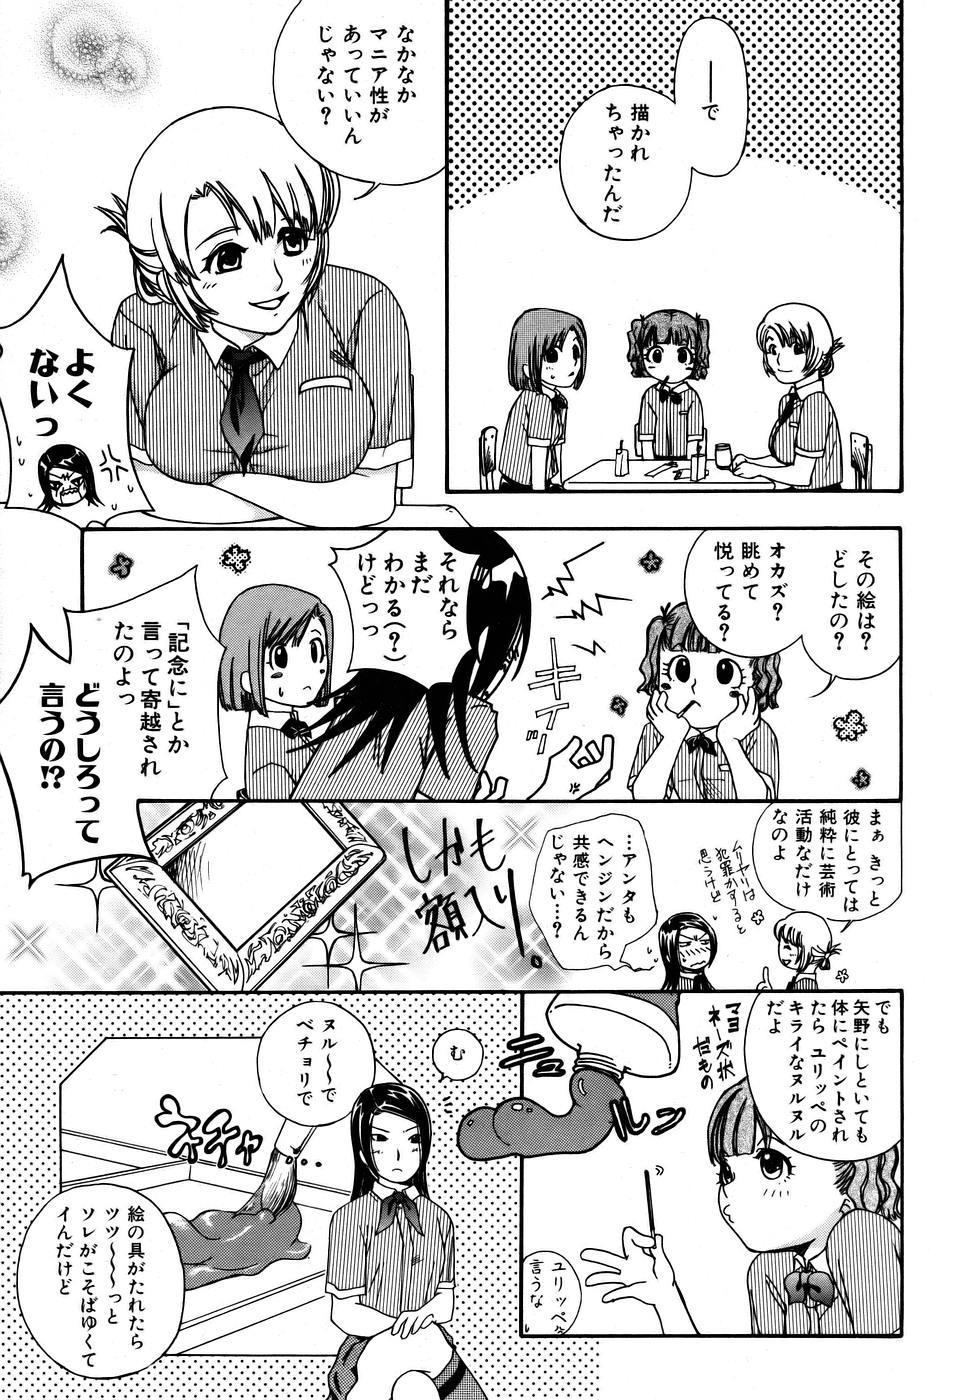 COMIC AUN 2005-12 Vol. 115 244